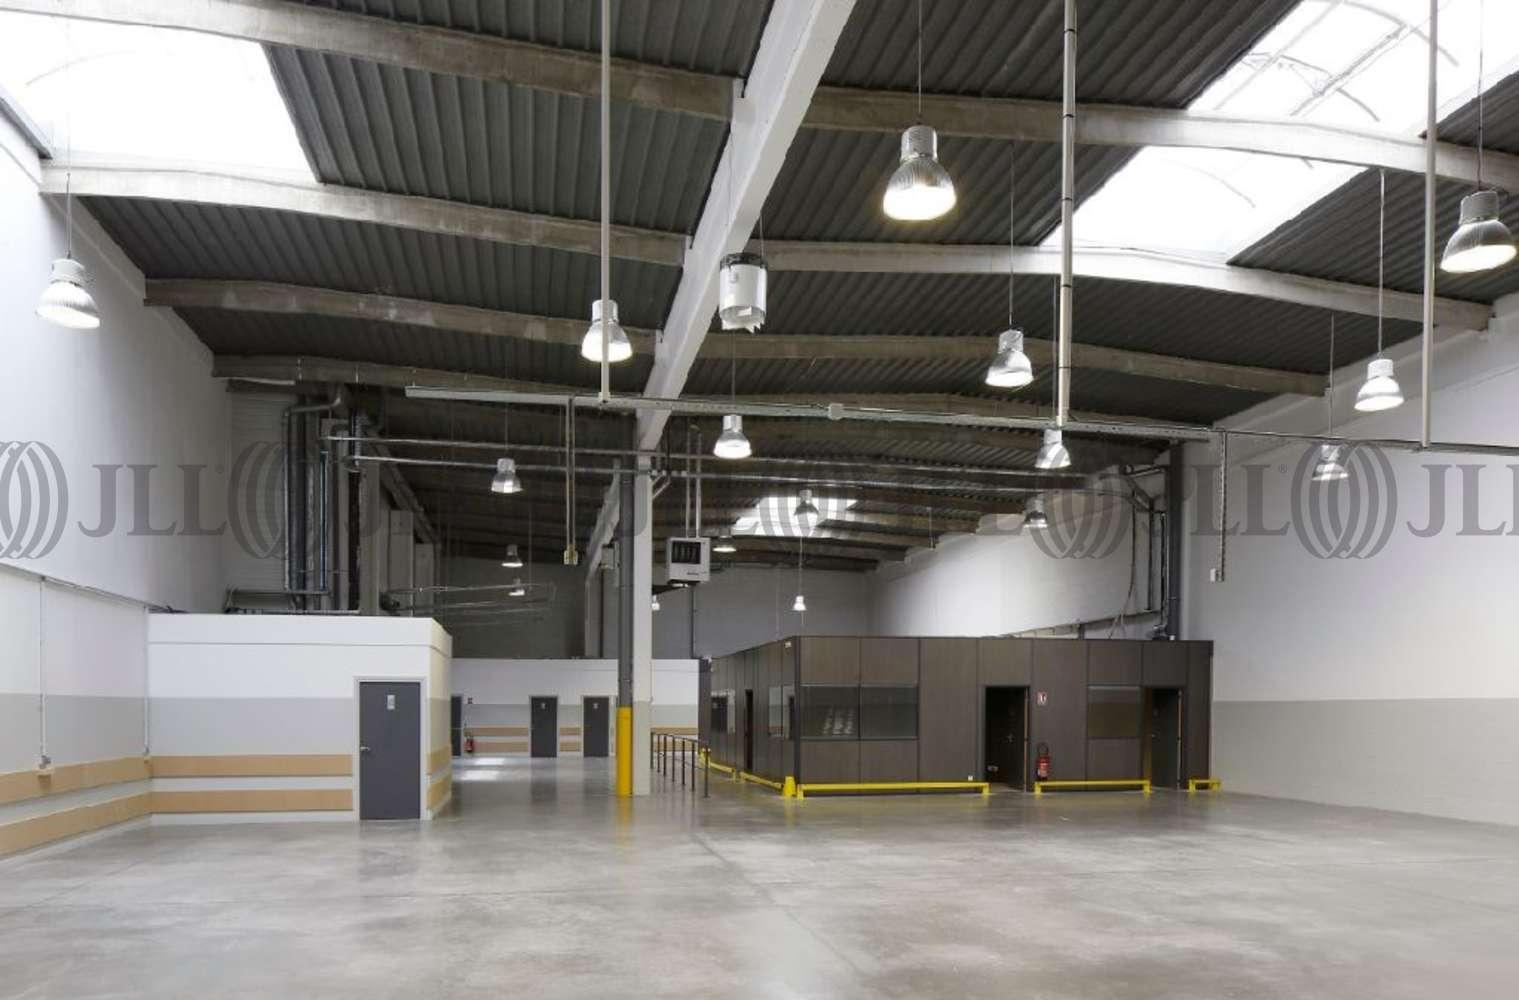 Activités/entrepôt Cergy st christophe, 95800